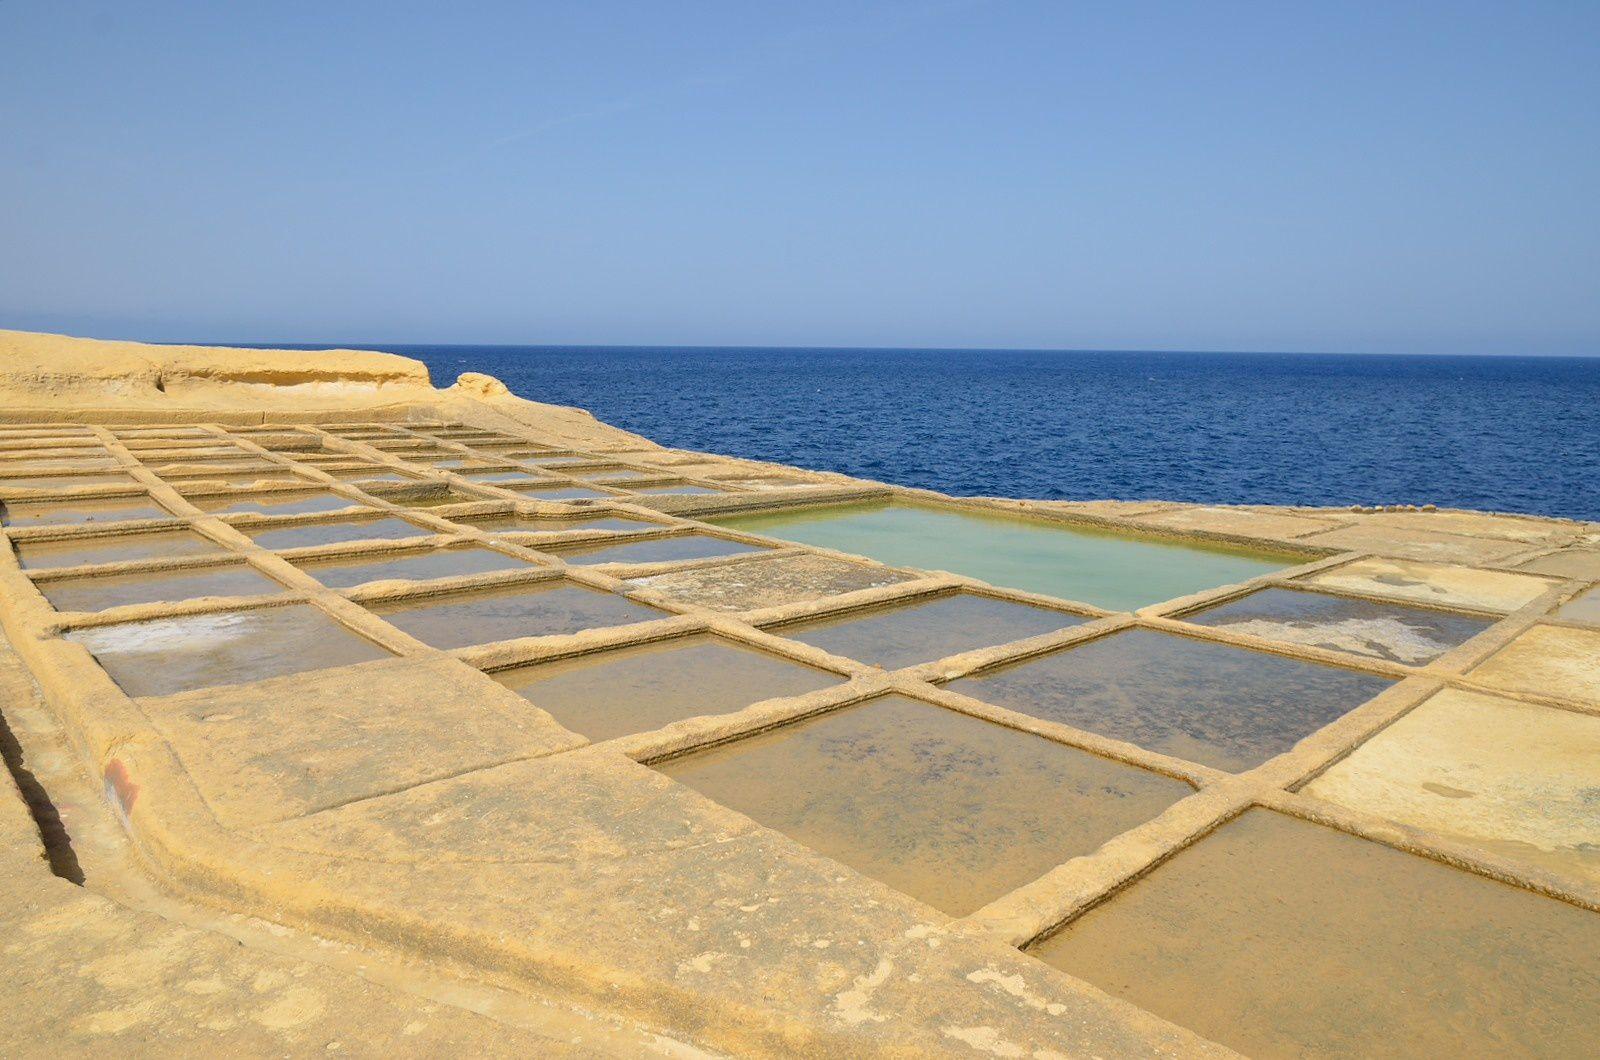 Les marais salants de la Baie de Xwejni